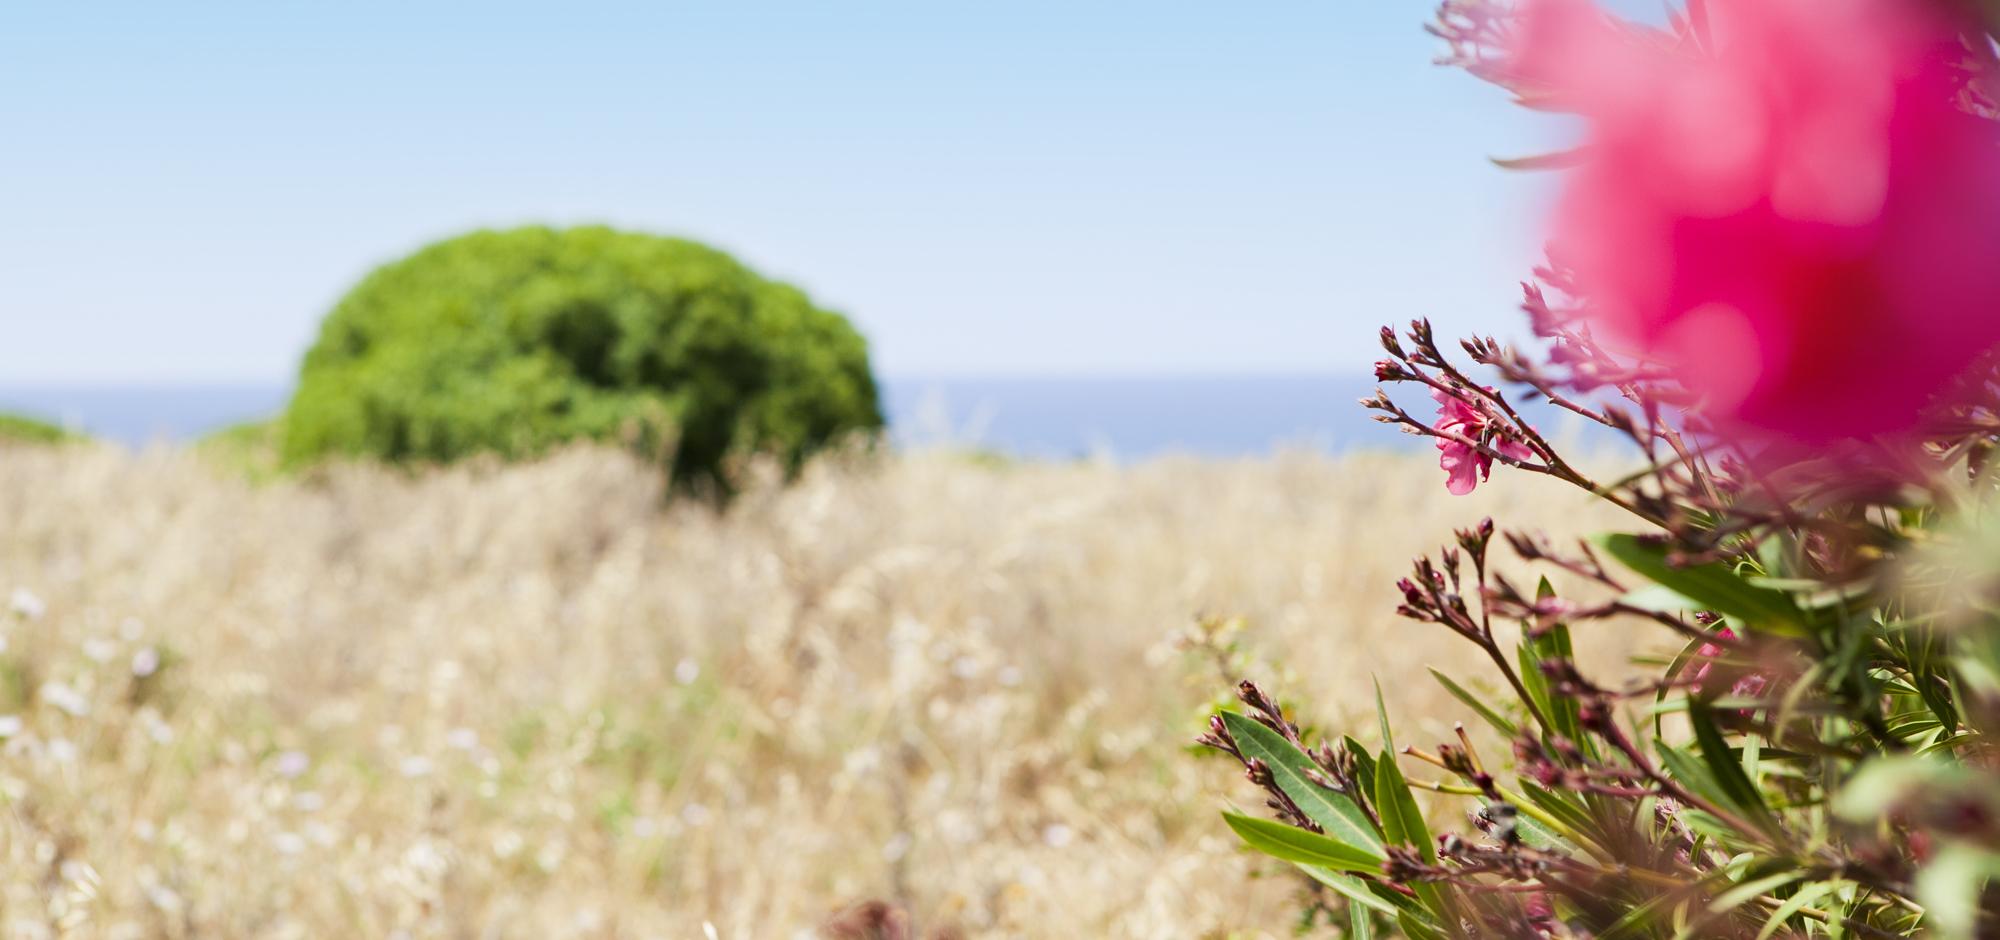 Blumen, pink, Meer, Sizilien, Fotografie, Katharina Steiner, Kath Viusal